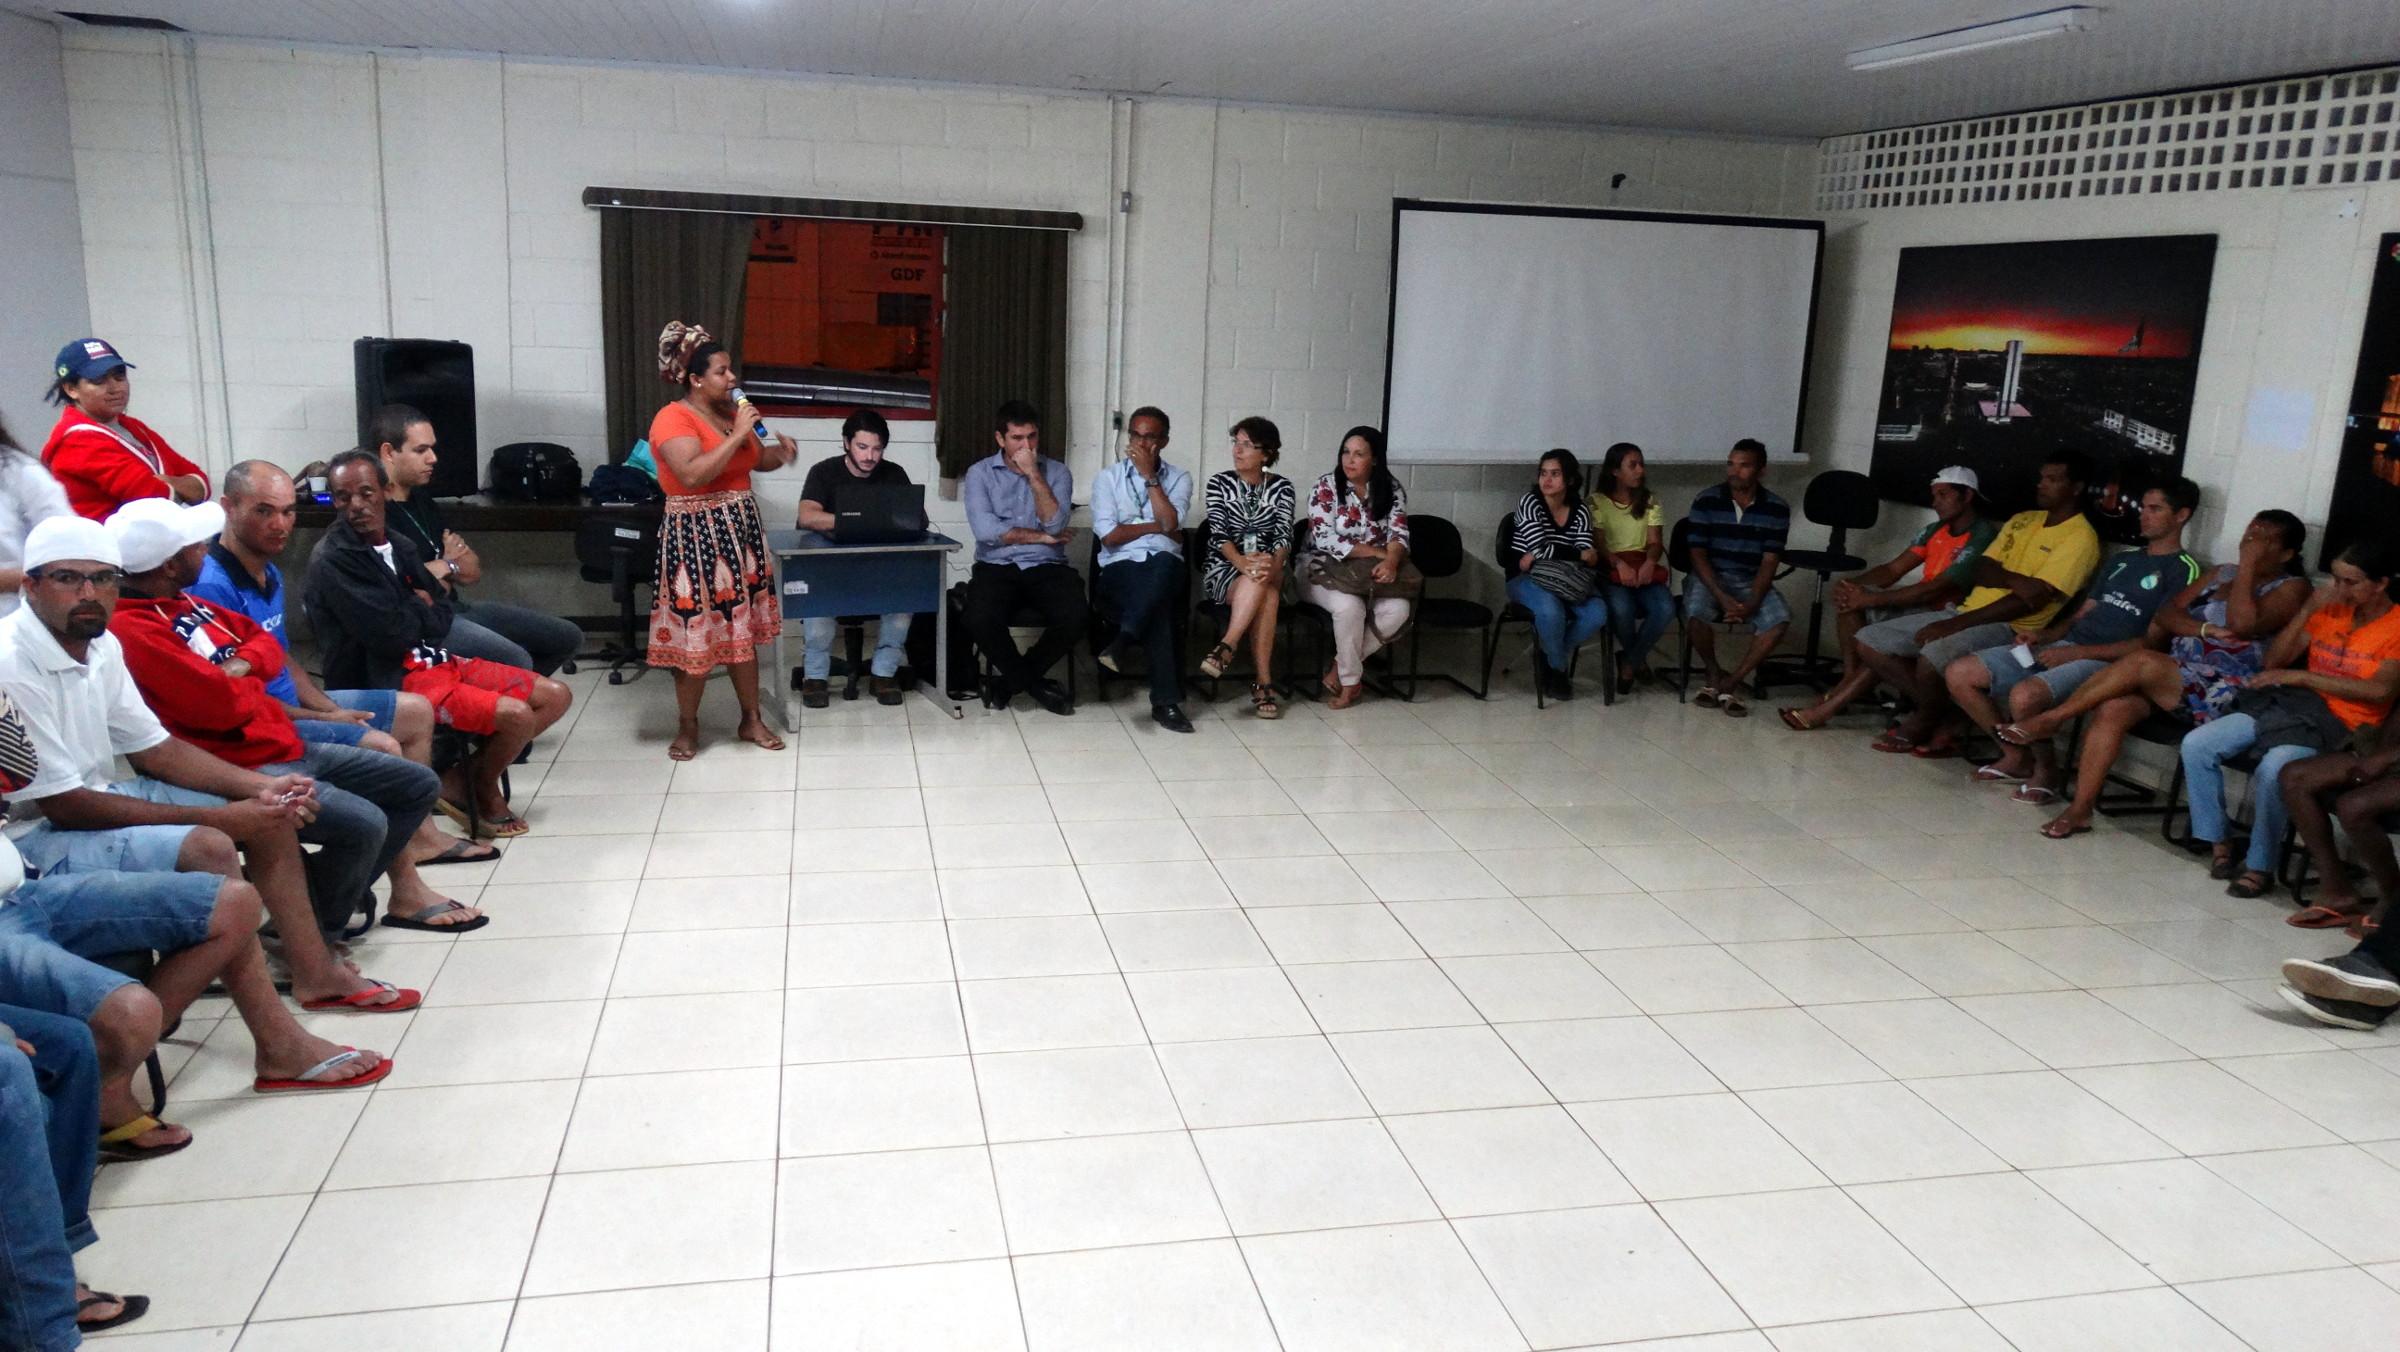 Fórum Lixo & Cidadania se consolida como espaço aberto de diálogo entre GDF, catadores e sociedade civil na Estrutural